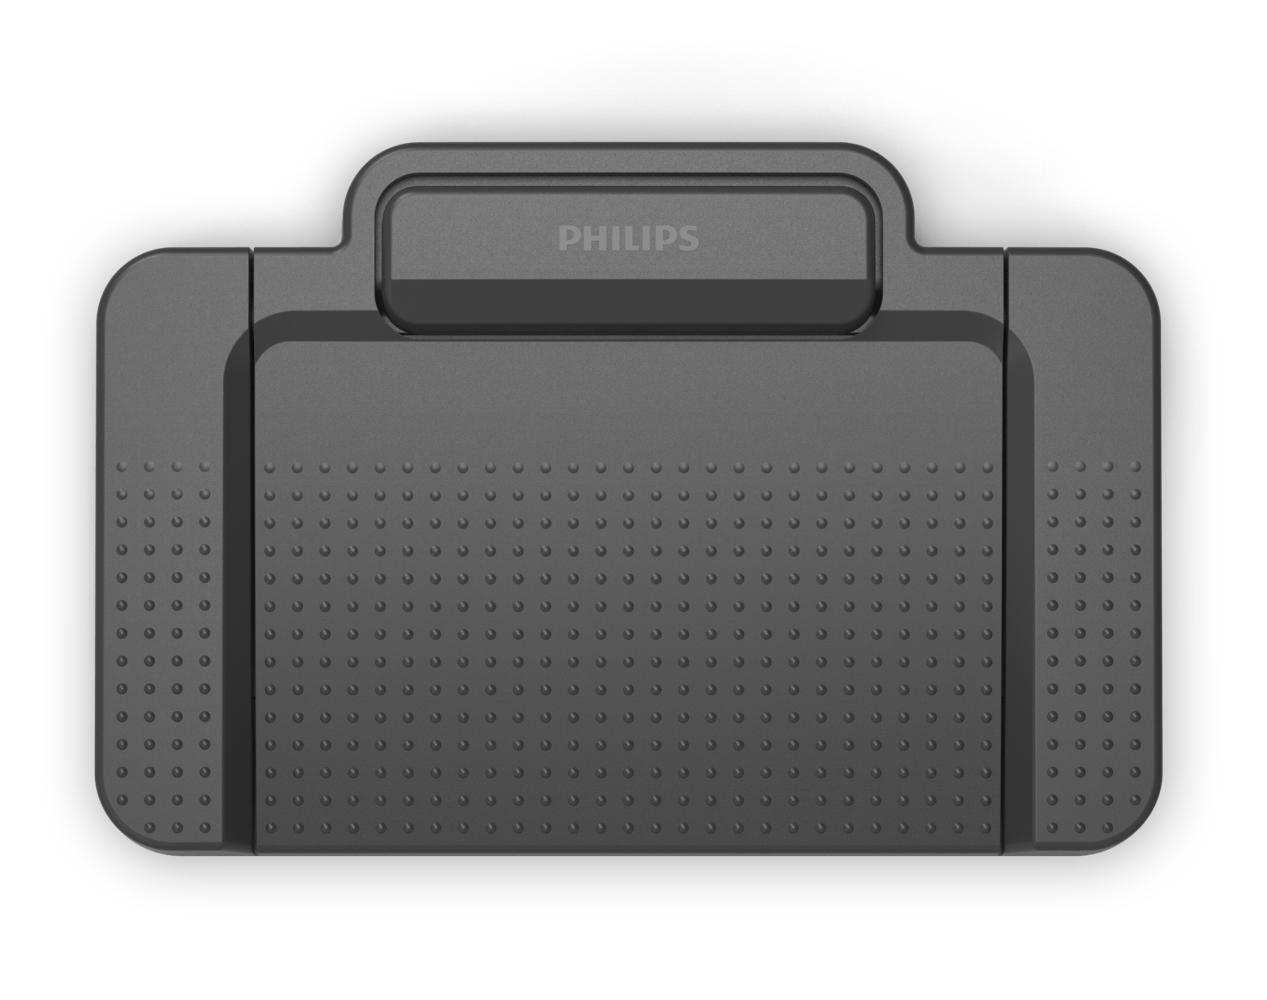 Philips ACC2330 USB Black